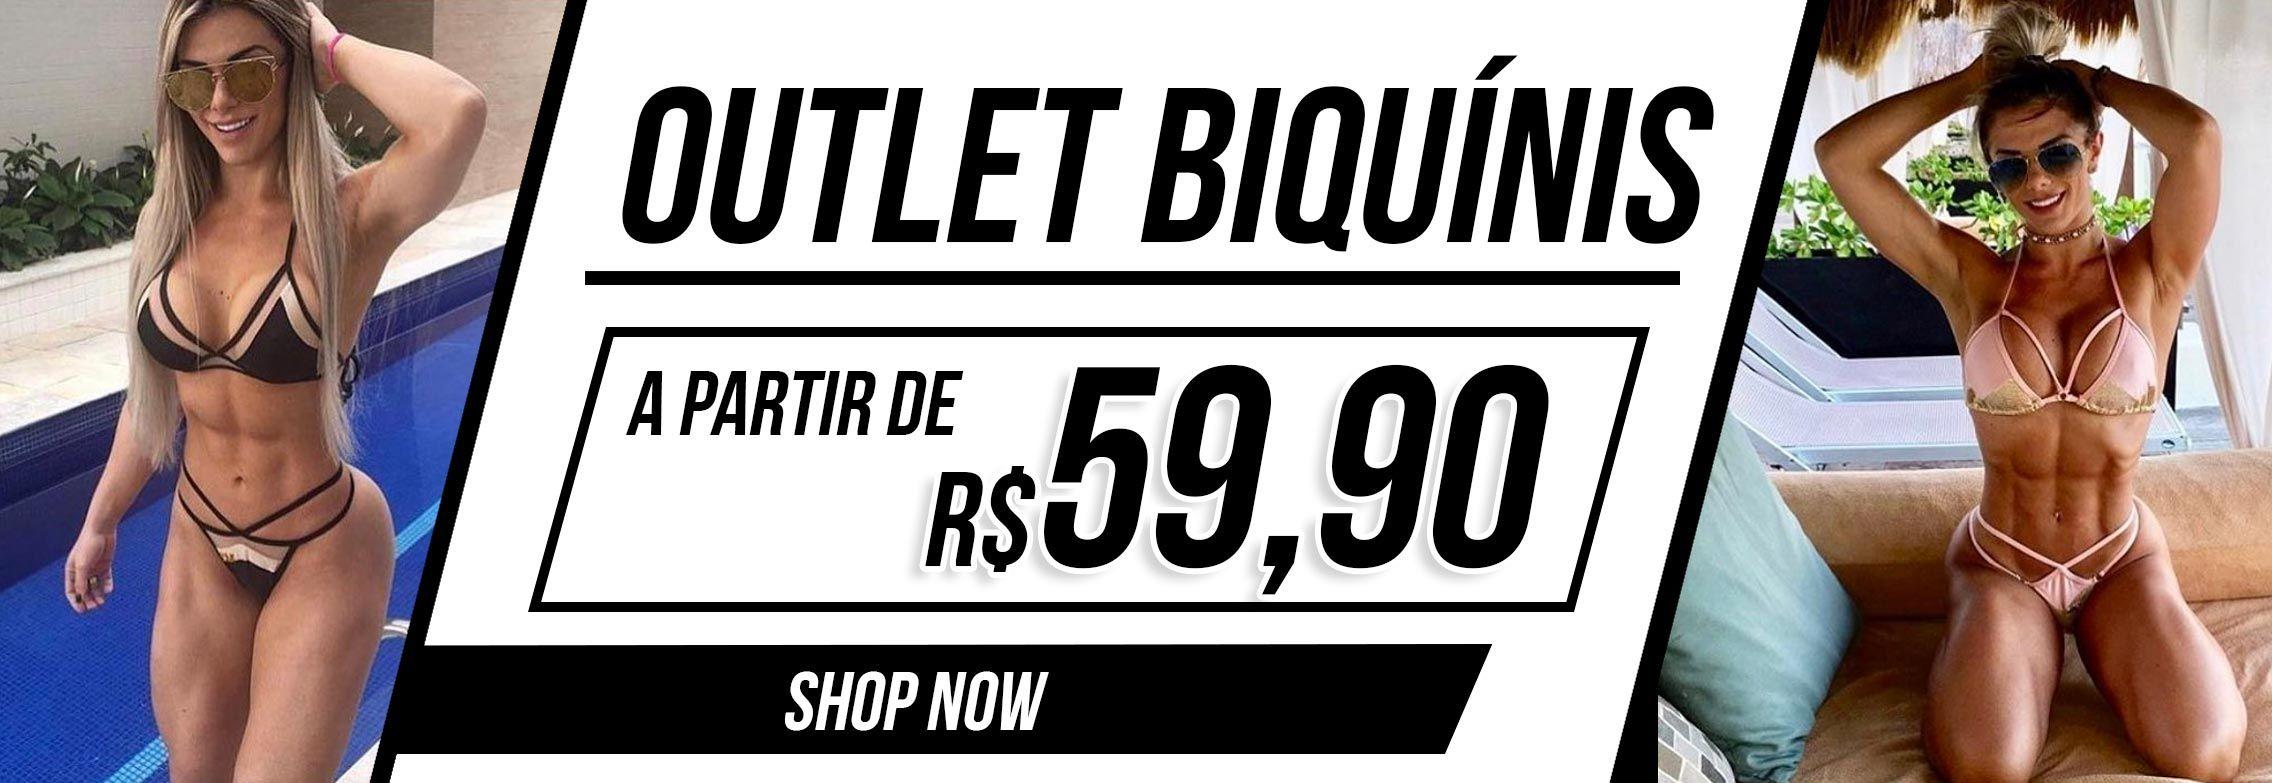 Outlet Biquinis